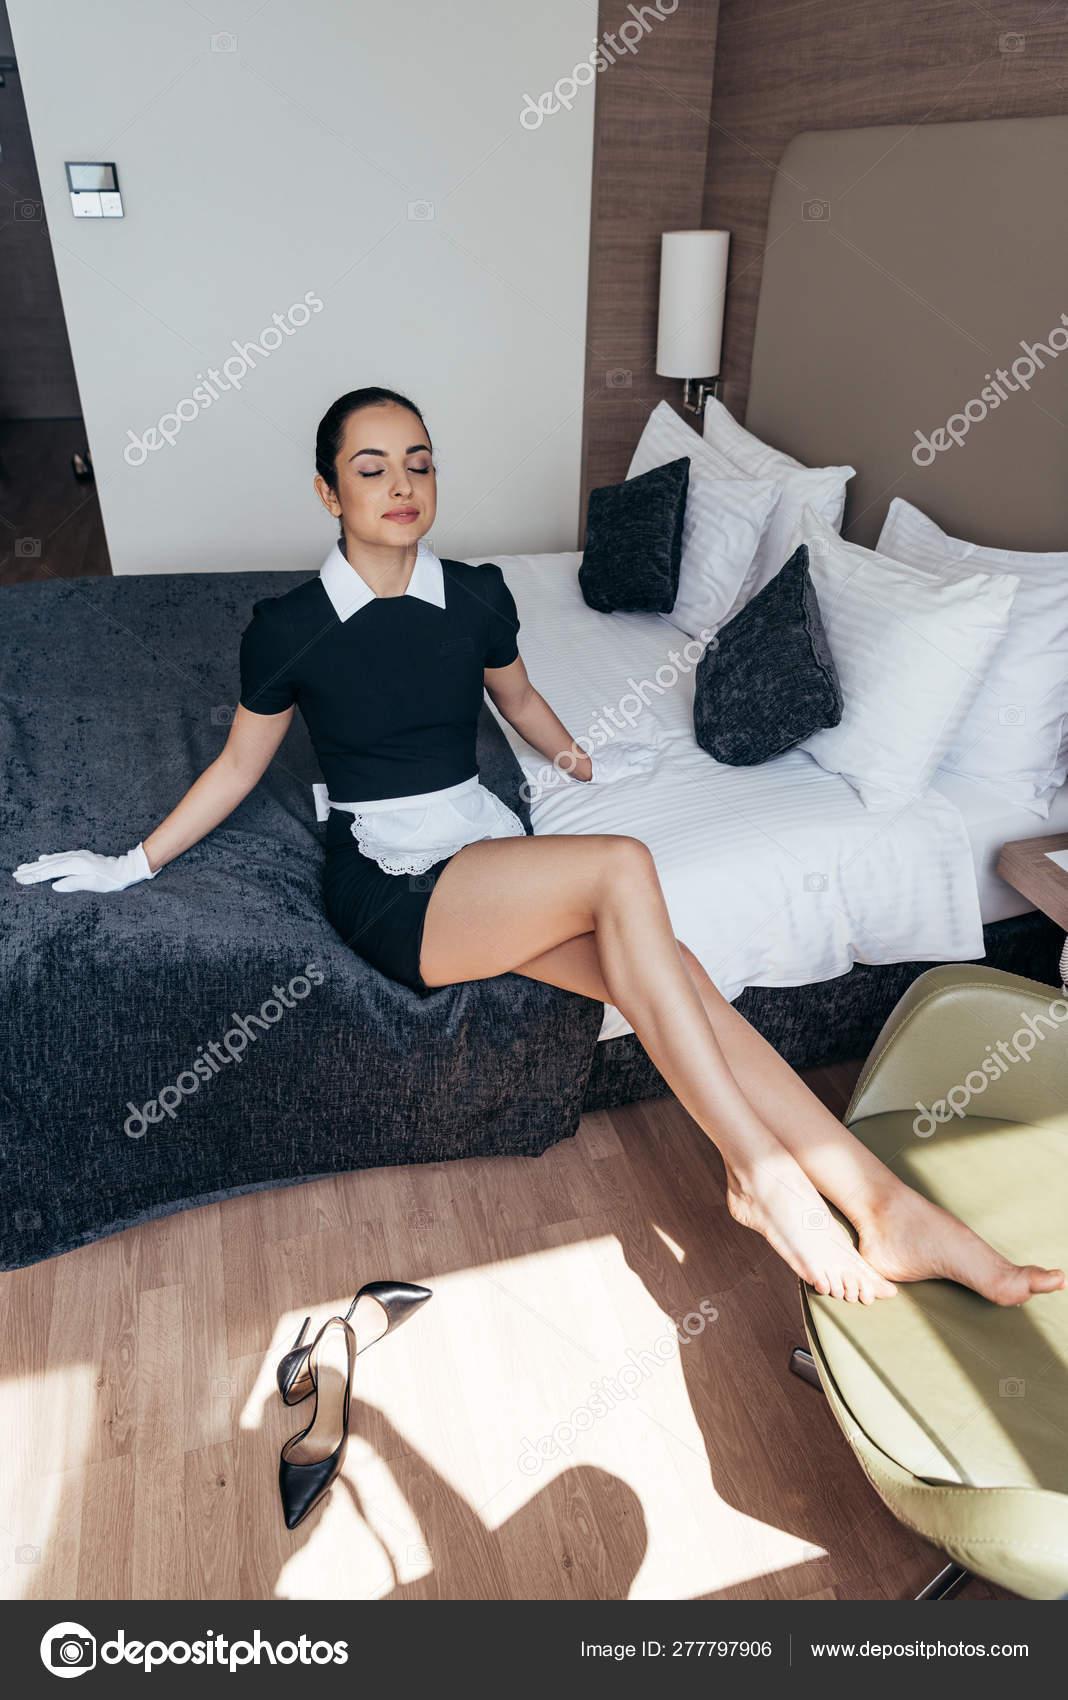 https://st4.depositphotos.com/12982378/27779/i/1600/depositphotos_277797906-stock-photo-barefoot-maid-white-apron-gloves.jpg